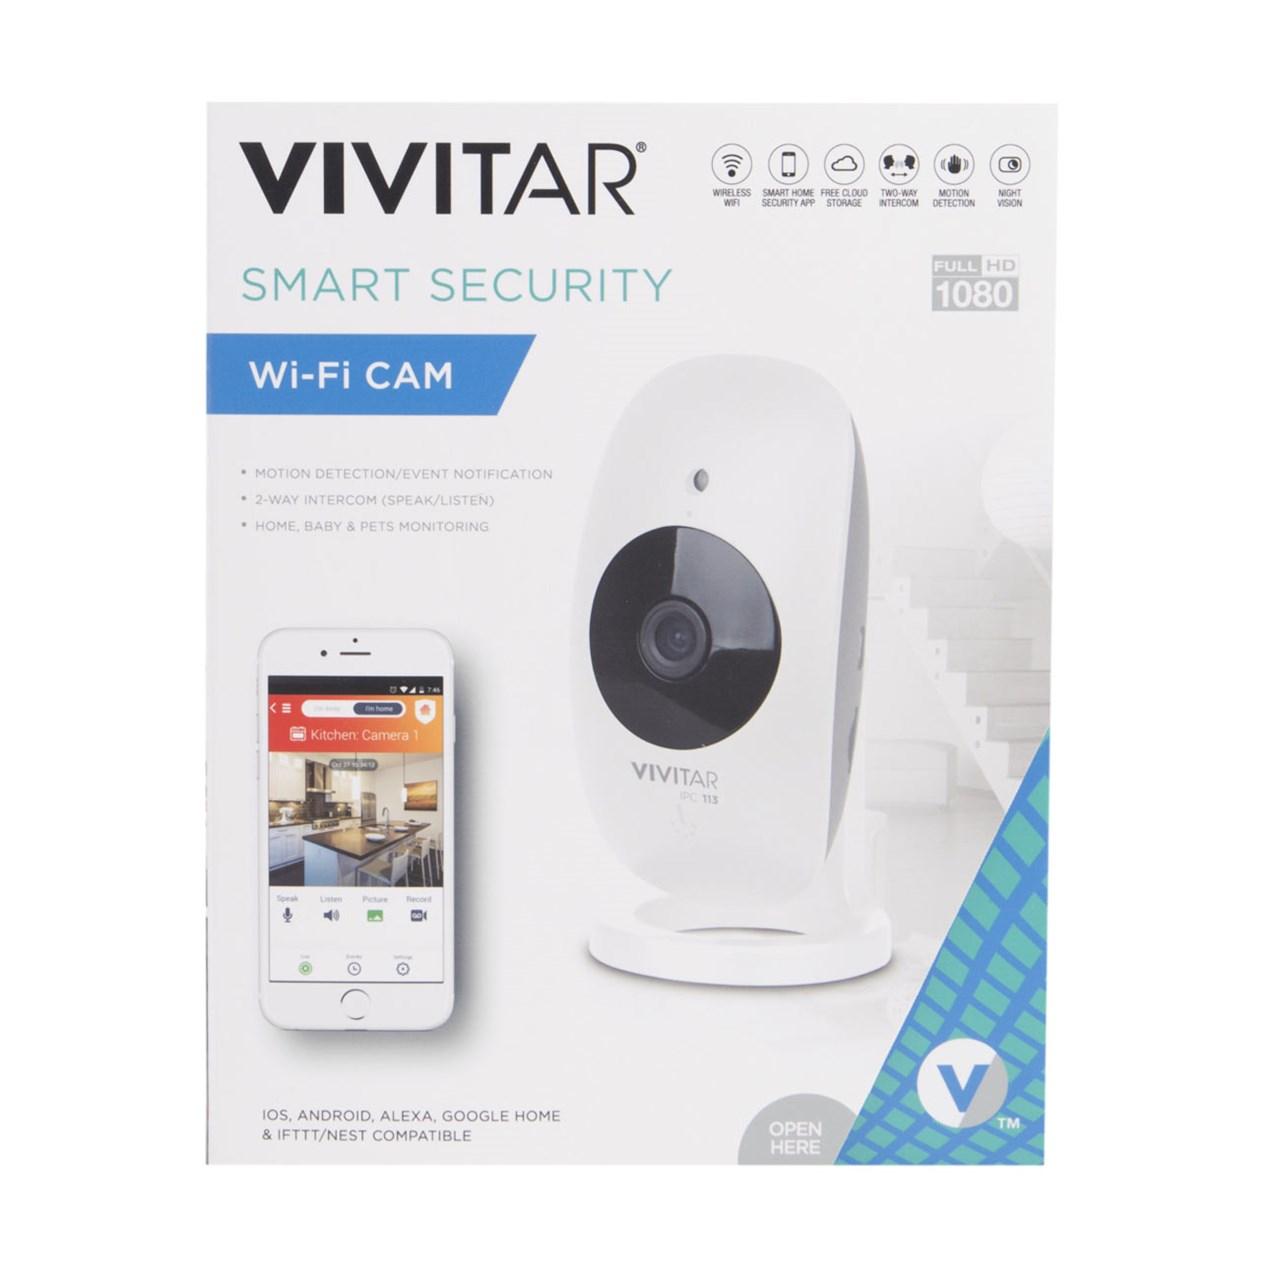 Vivitar Smart Security Wifi Camera